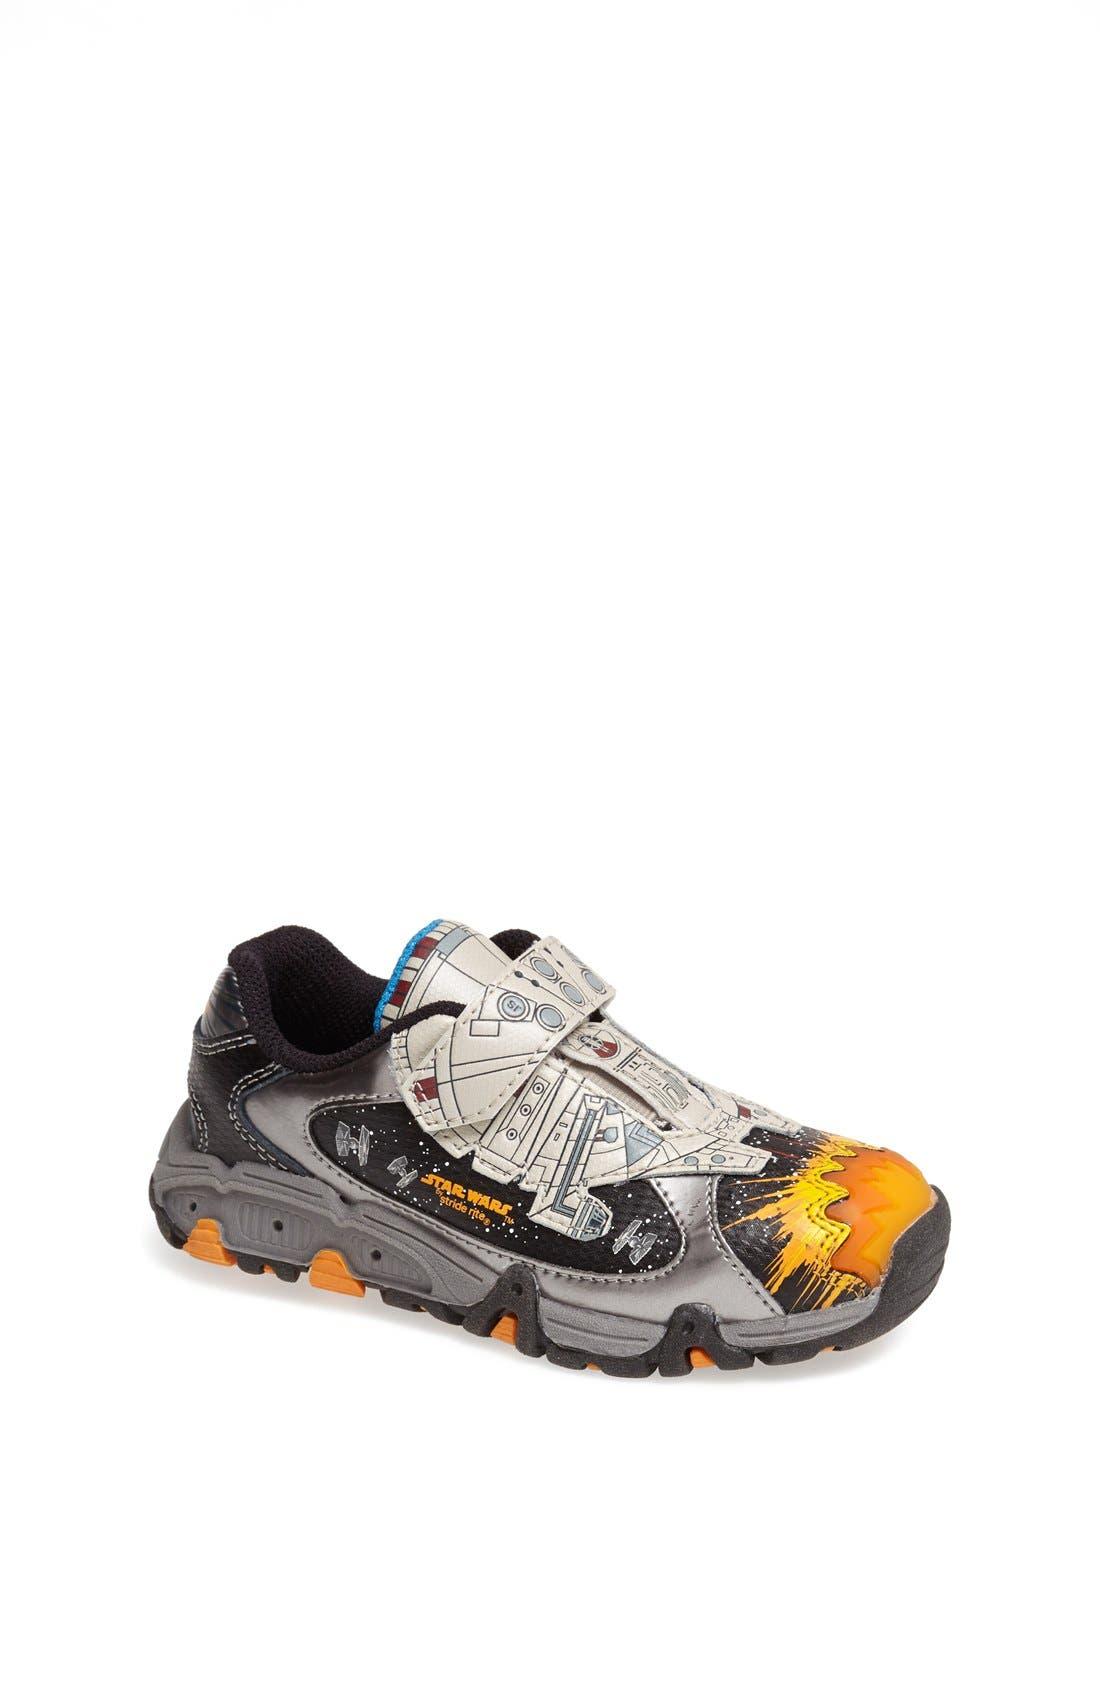 Alternate Image 1 Selected - Stride Rite 'Star Wars™  - Millenium Falcon™' Light-Up Sneaker (Toddler & Little Kid)